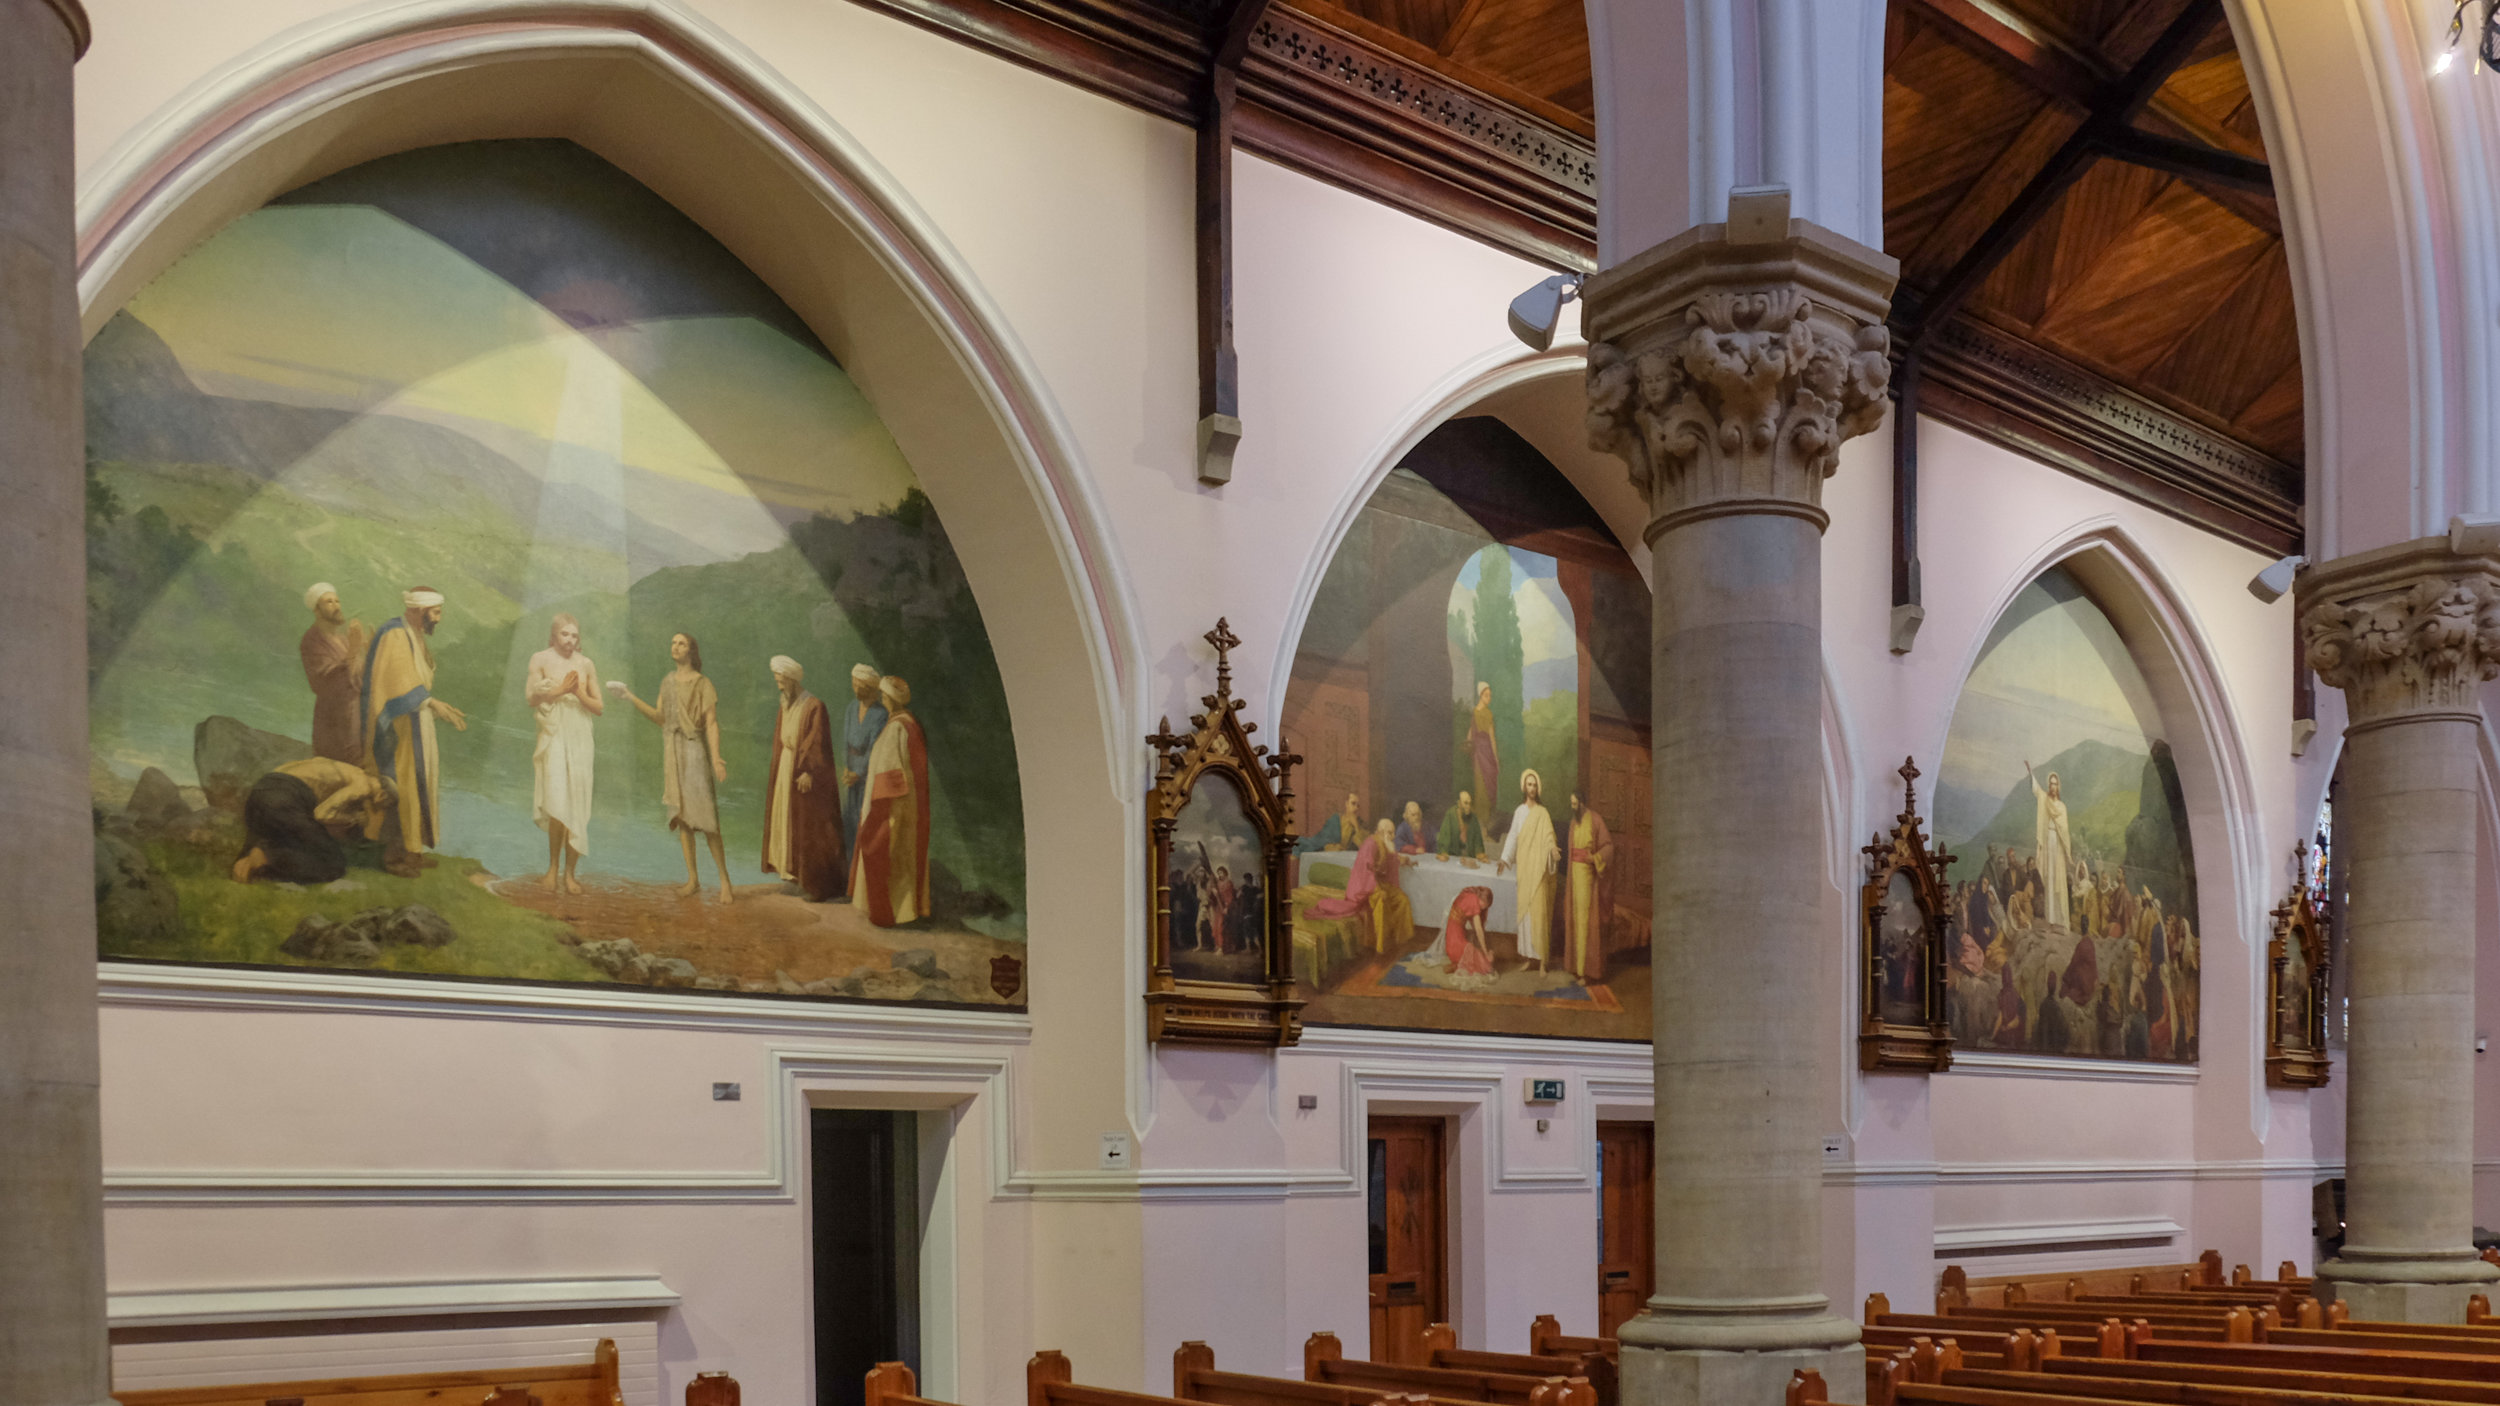 St Michael's Church Enniskillen